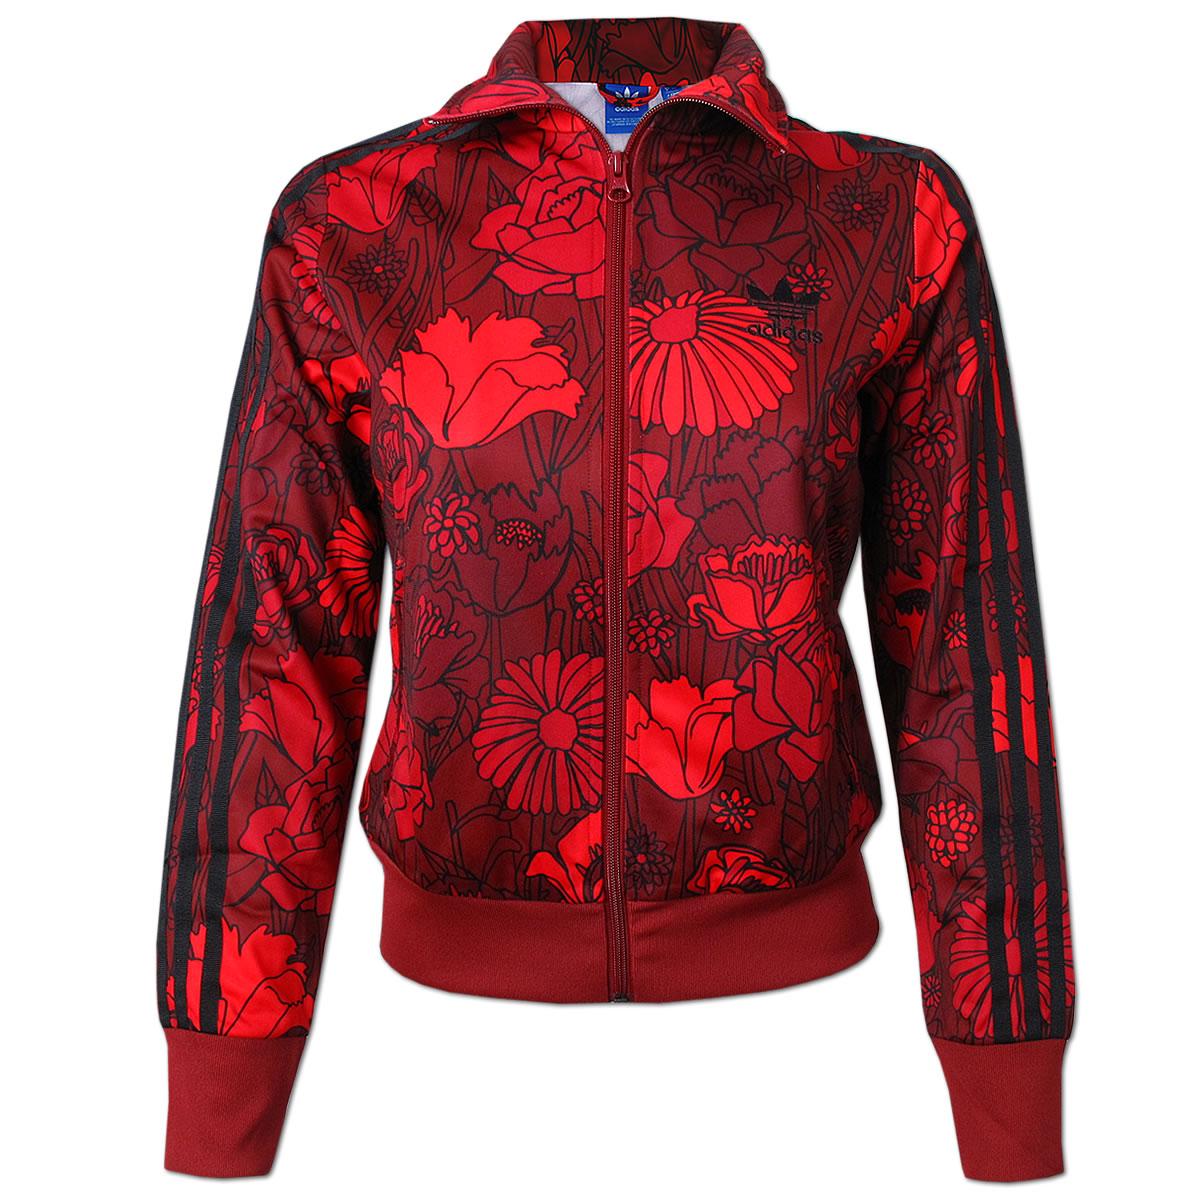 adidas Firebird Track Top Jacke rot multicolor (AY7946)